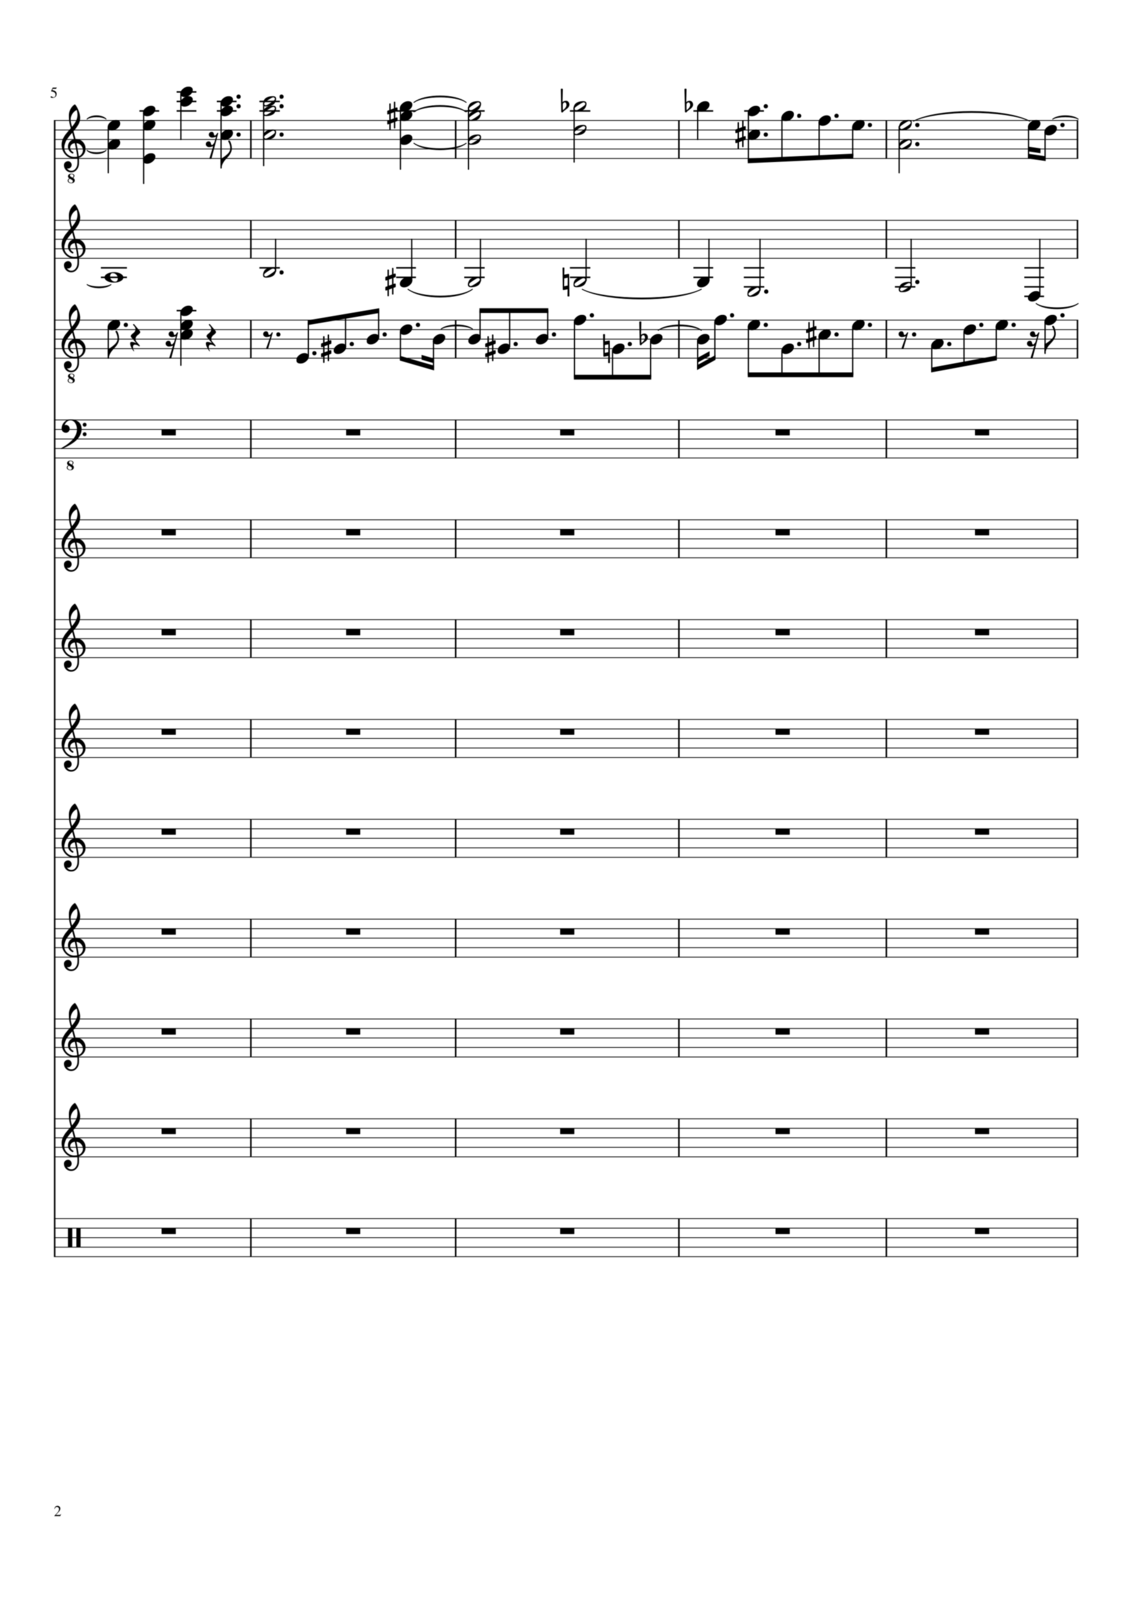 Prosti slide, Image 2